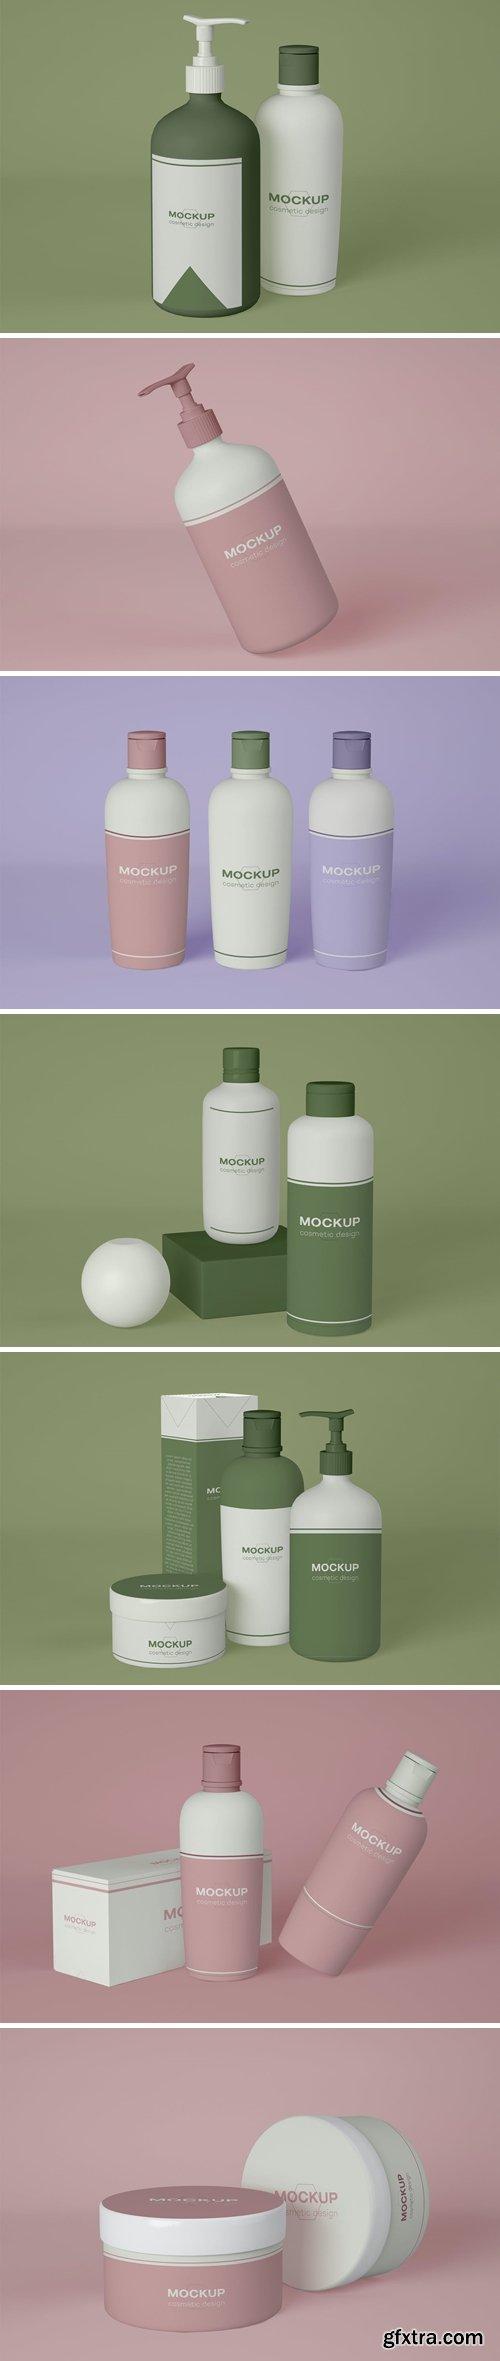 Cosmetics and Cosmetics Dispenser Mockup